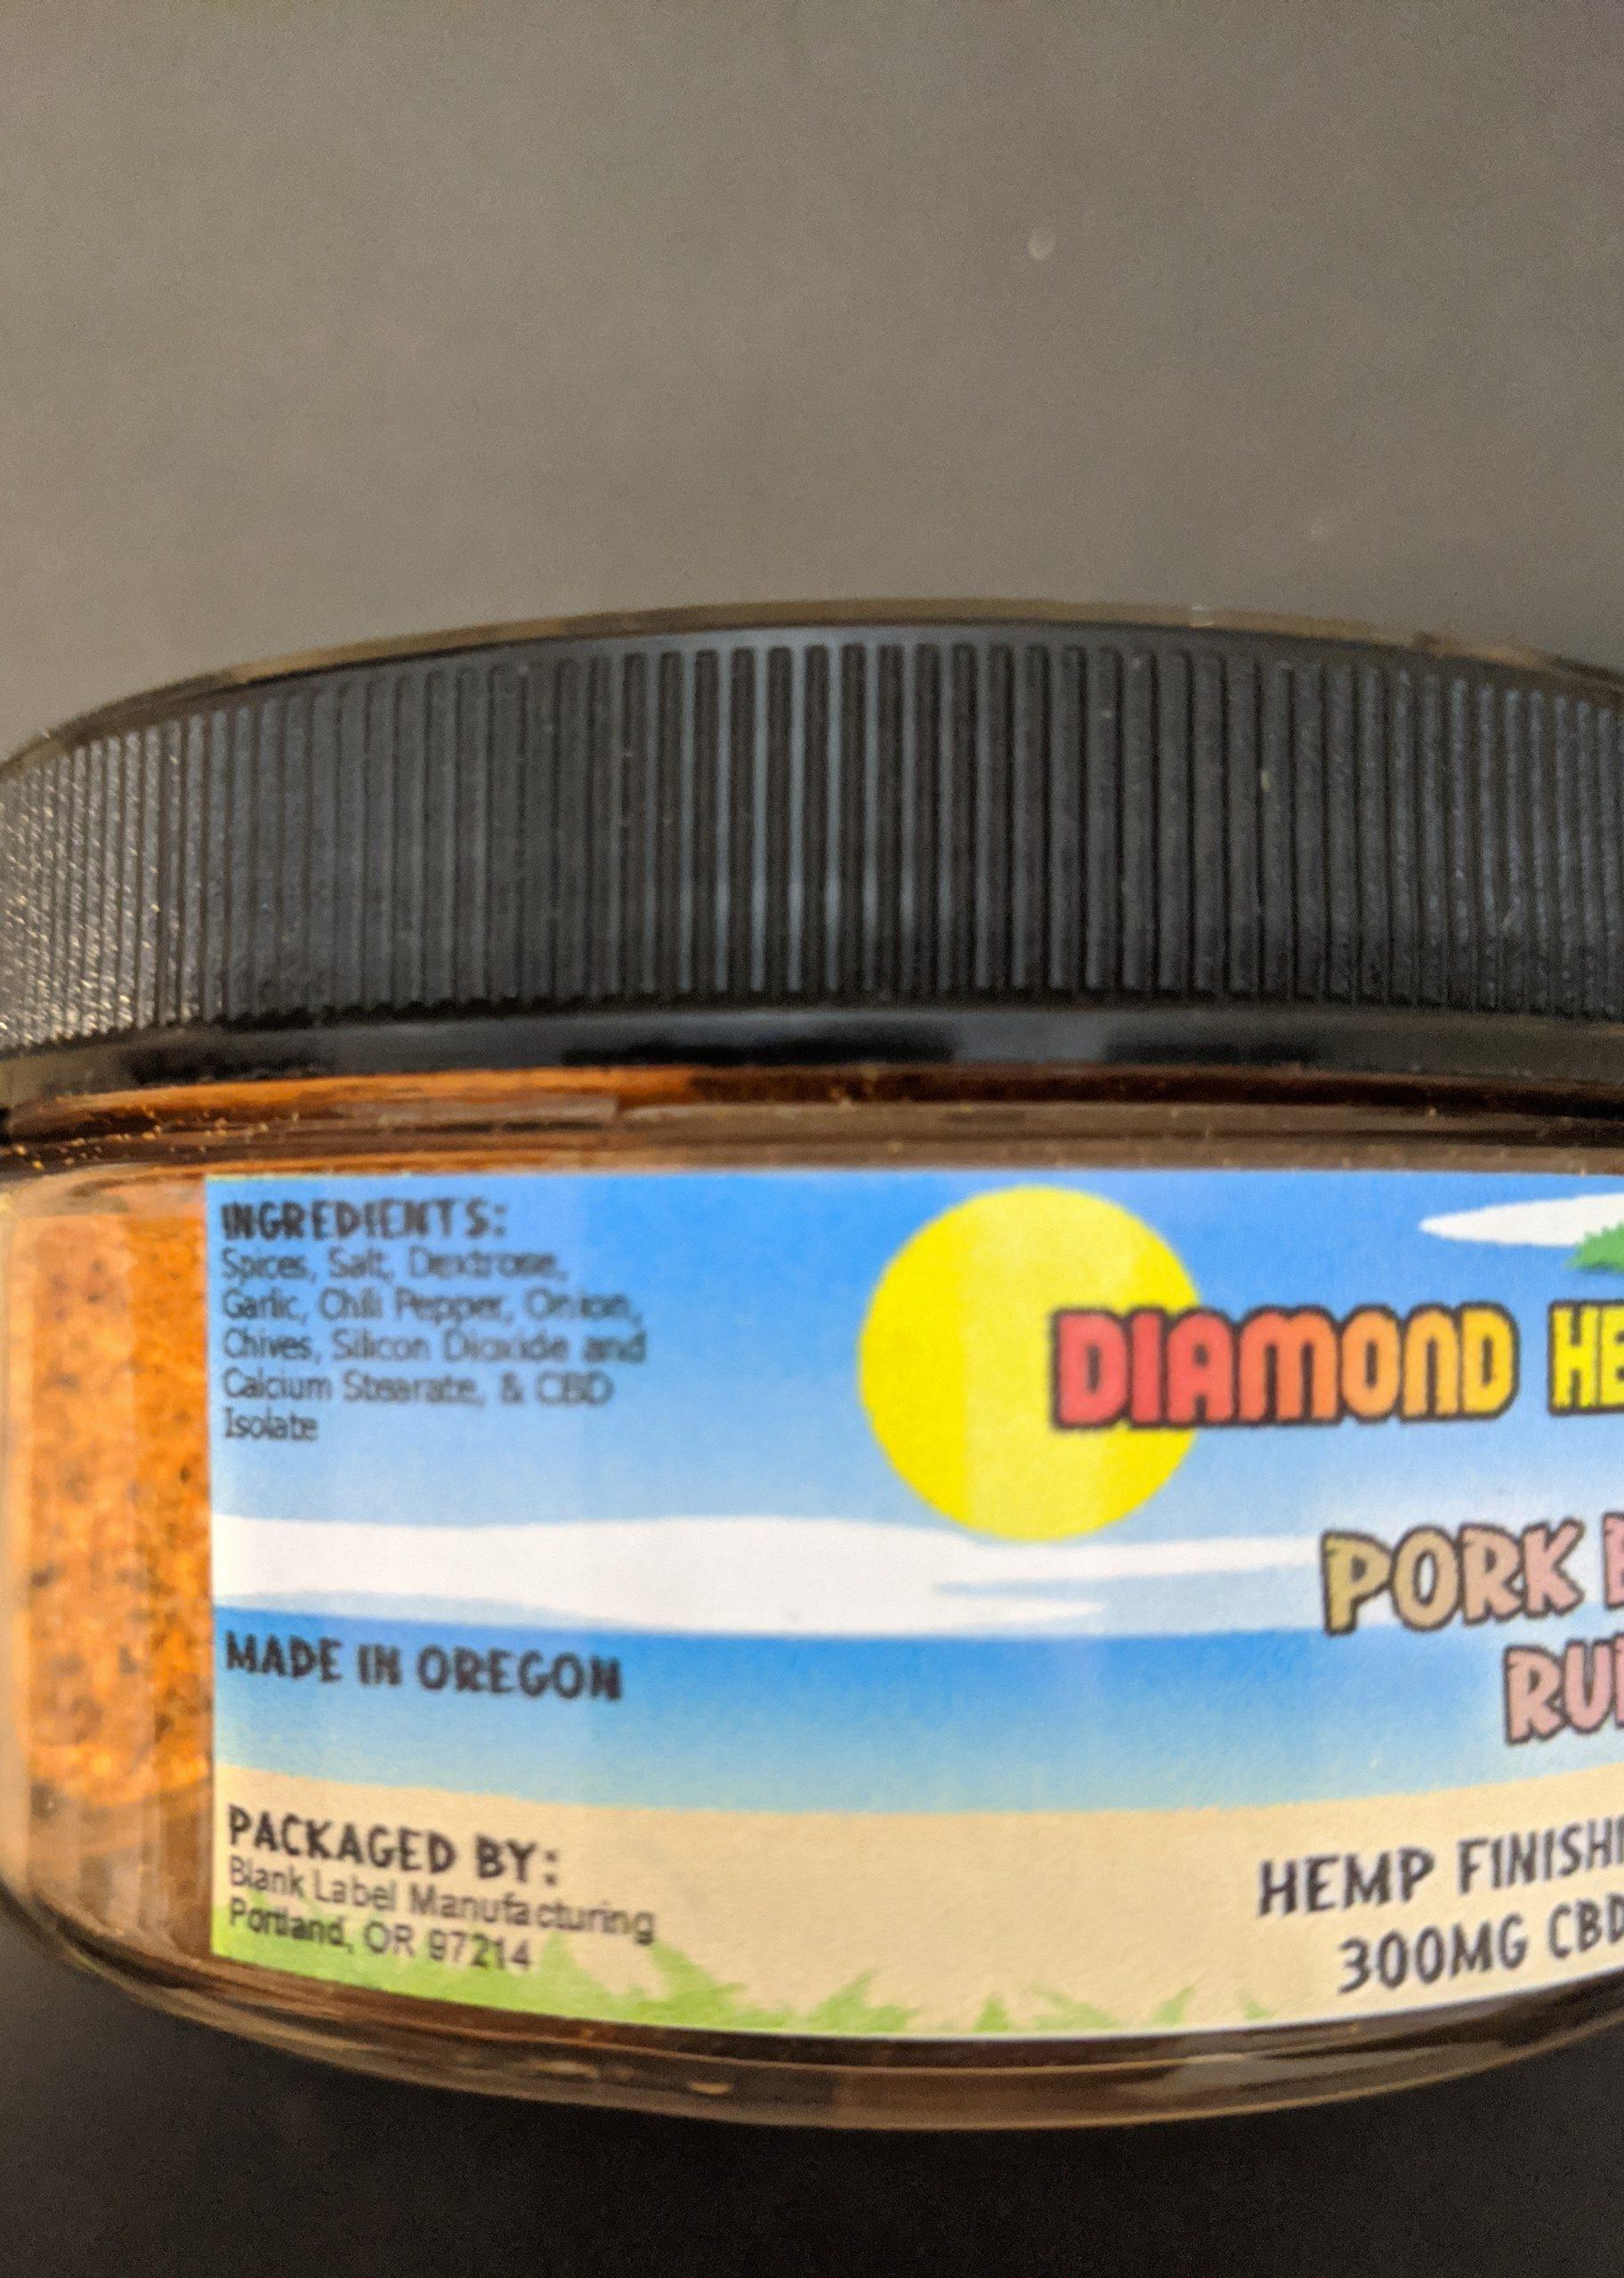 Delicious Pork Butt Seasonings CBD infused